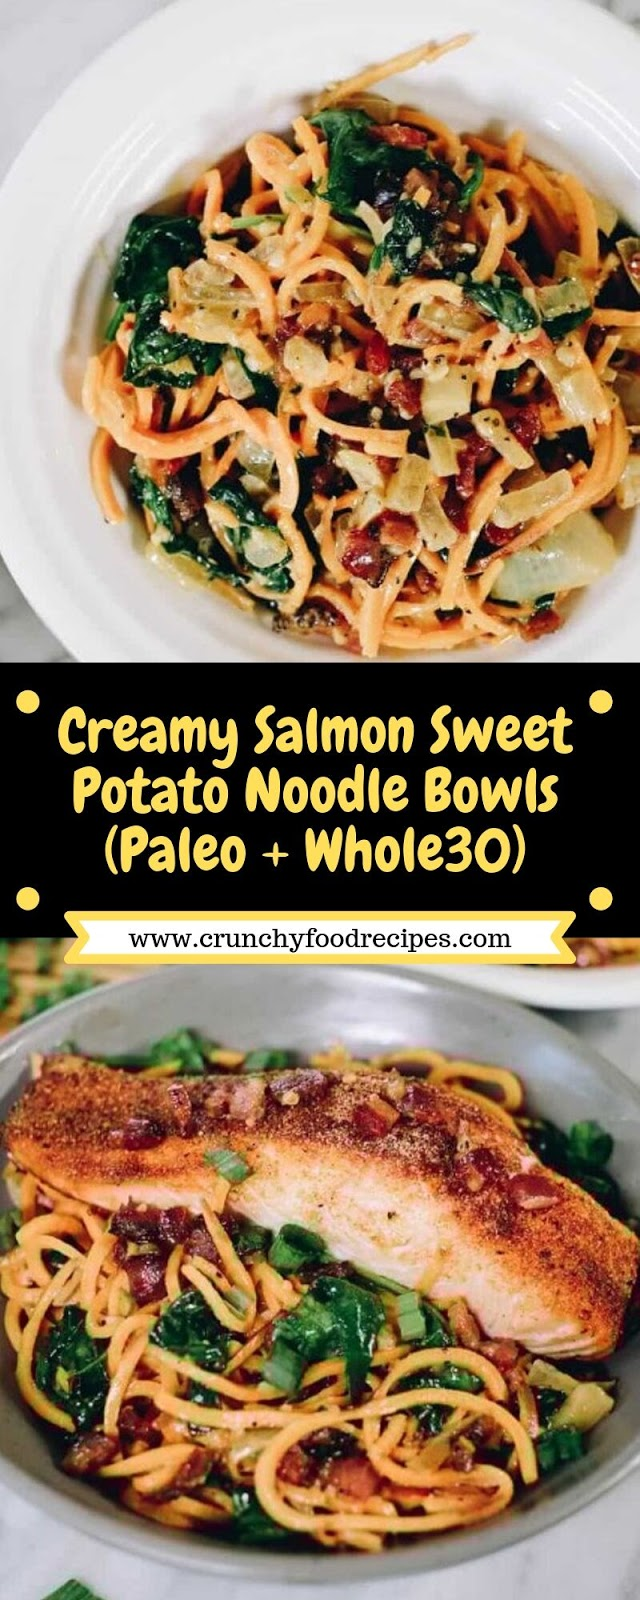 Creamy Salmon Sweet Potato Noodle Bowls (Paleo + Whole30)